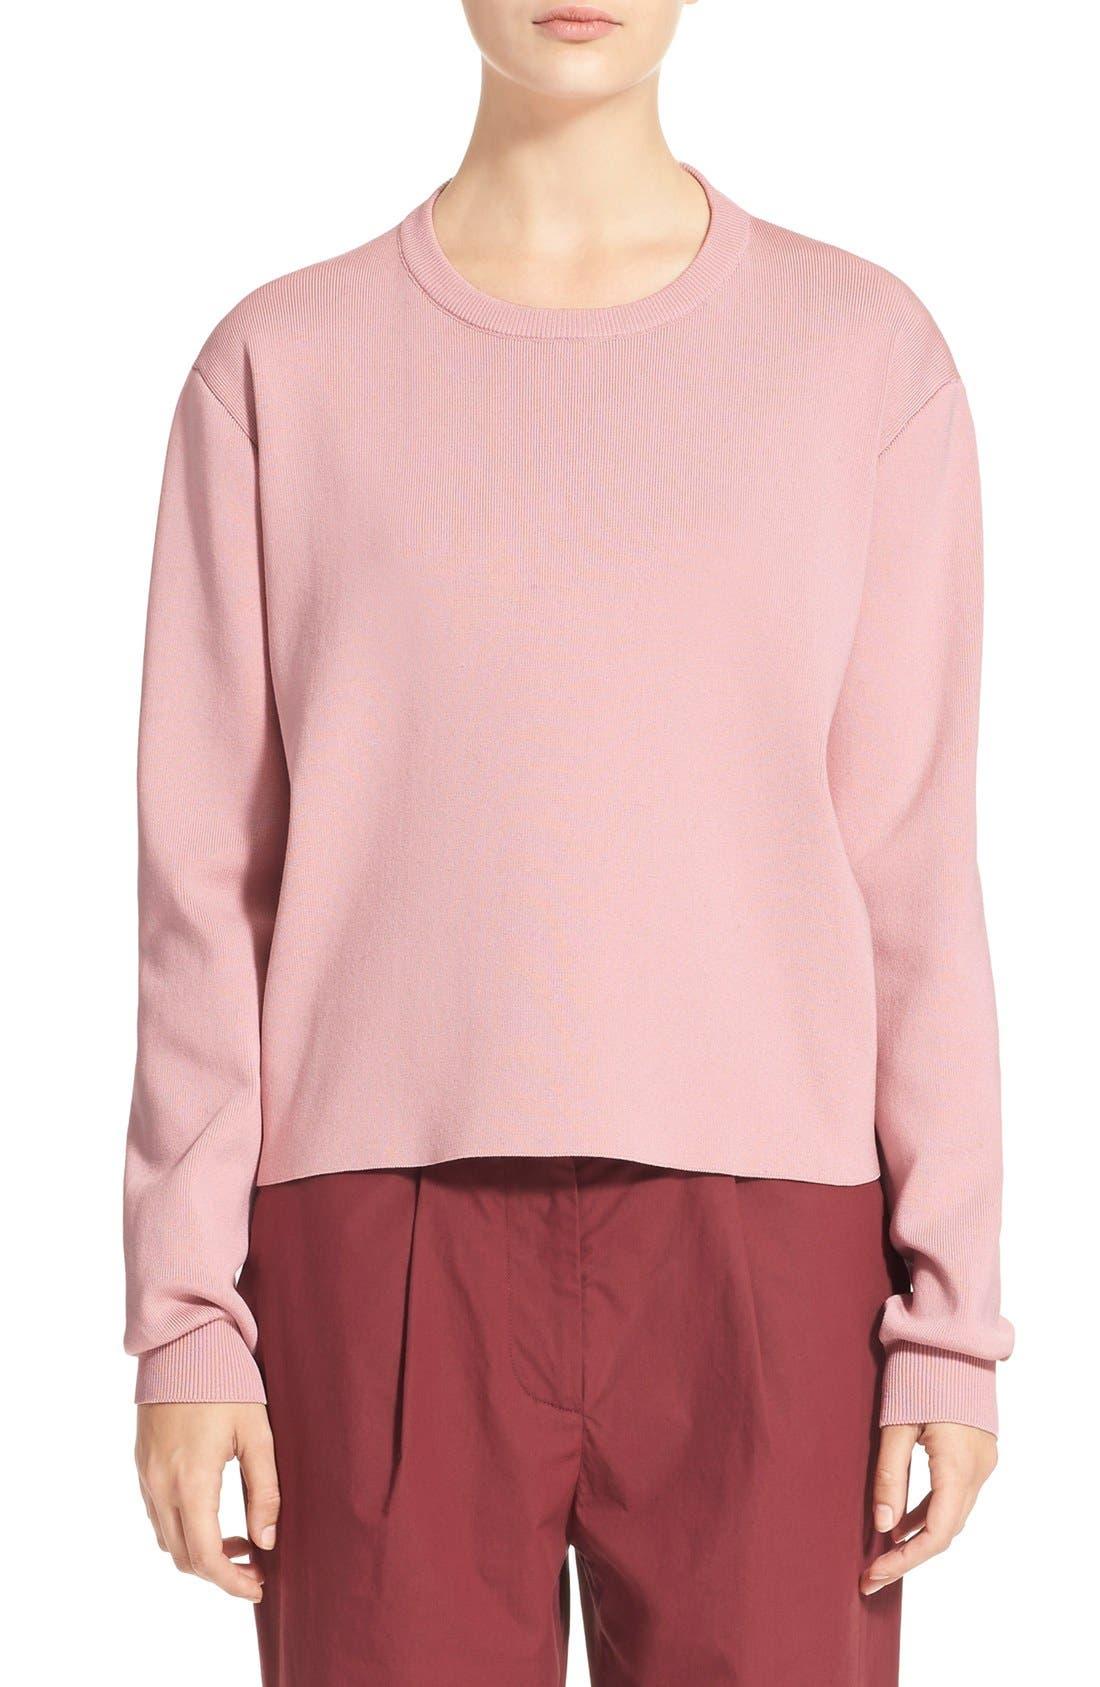 Main Image - ACNE 'Misty Clean' Cotton Crewneck Sweater